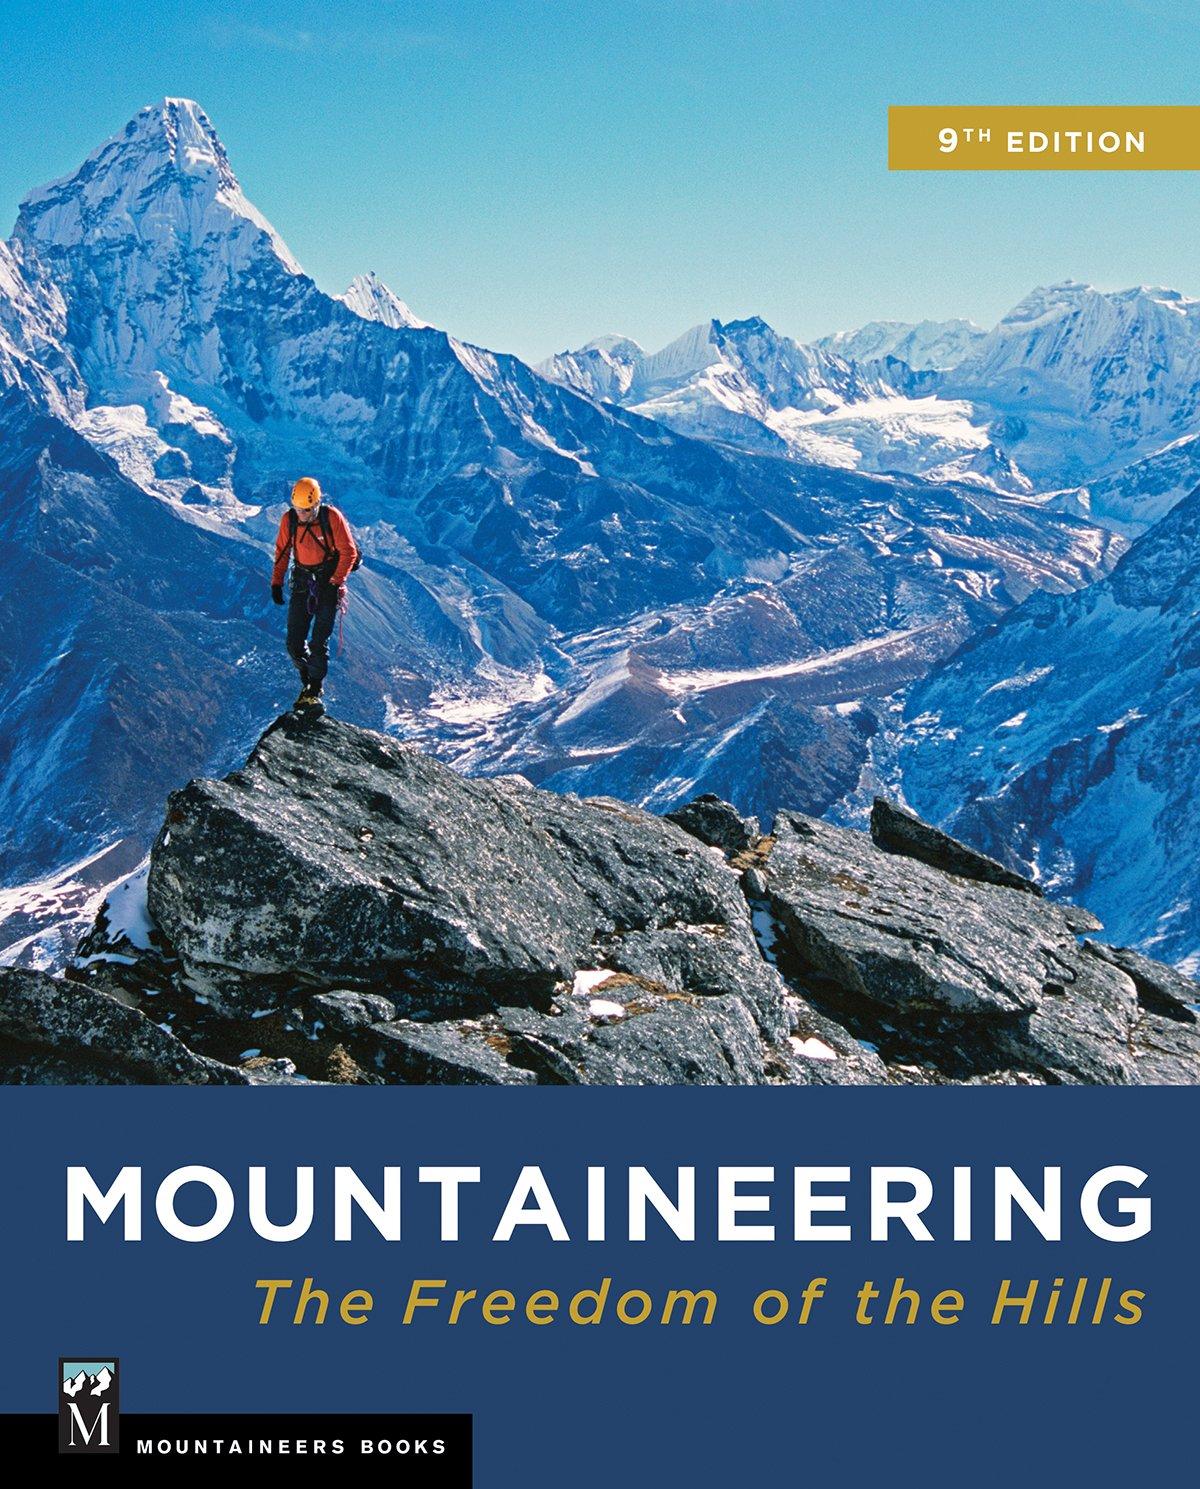 MOUNTAINEERING BOOKS EPUB